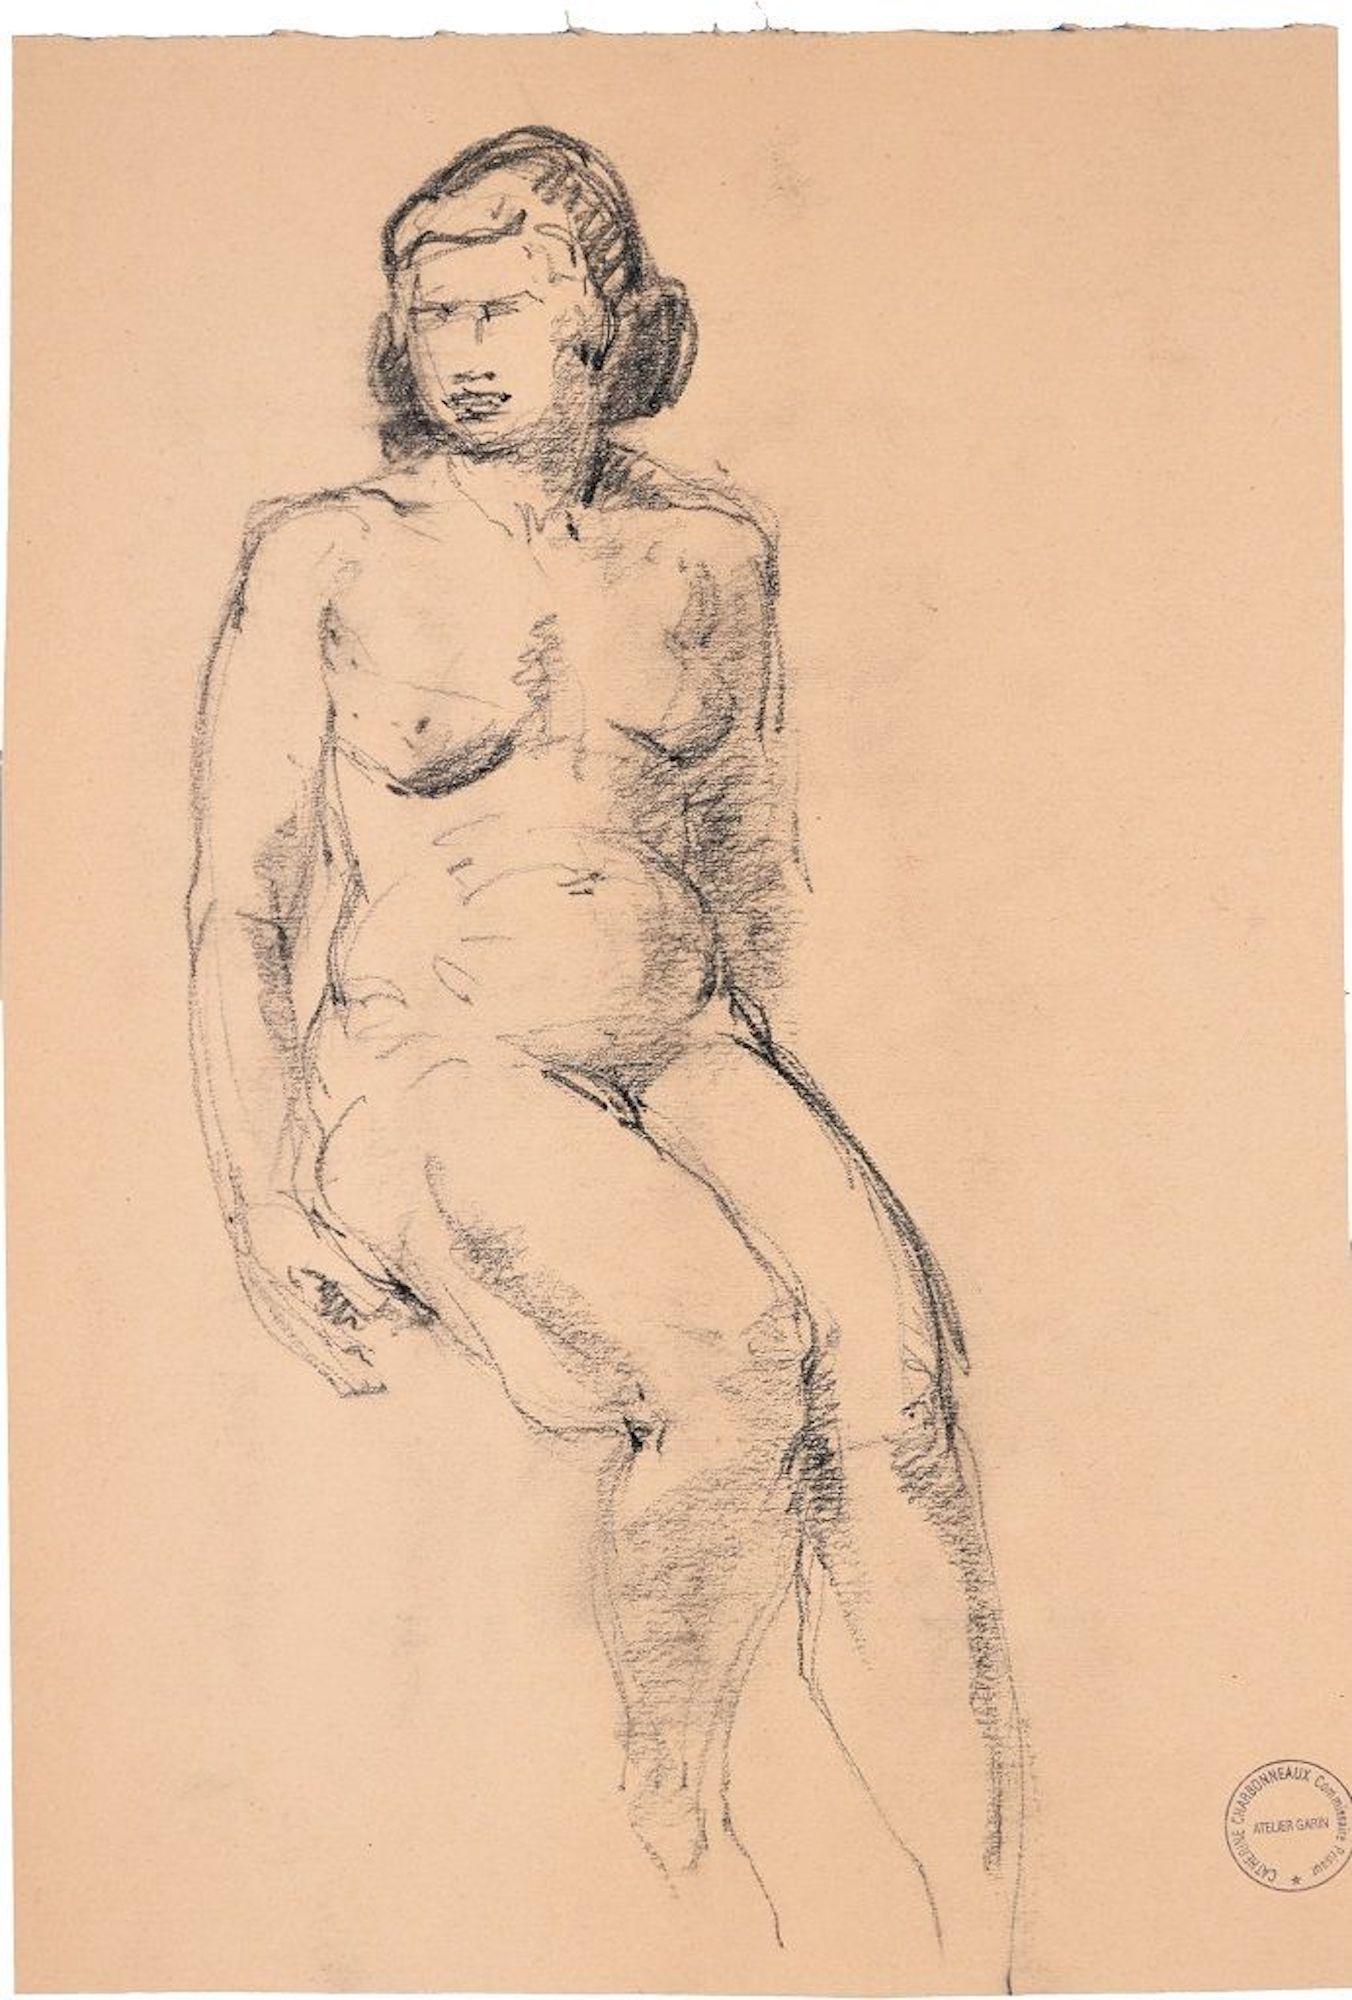 Sitting Woman - Original Charcoal Drawing by Paul Garin - 1950s